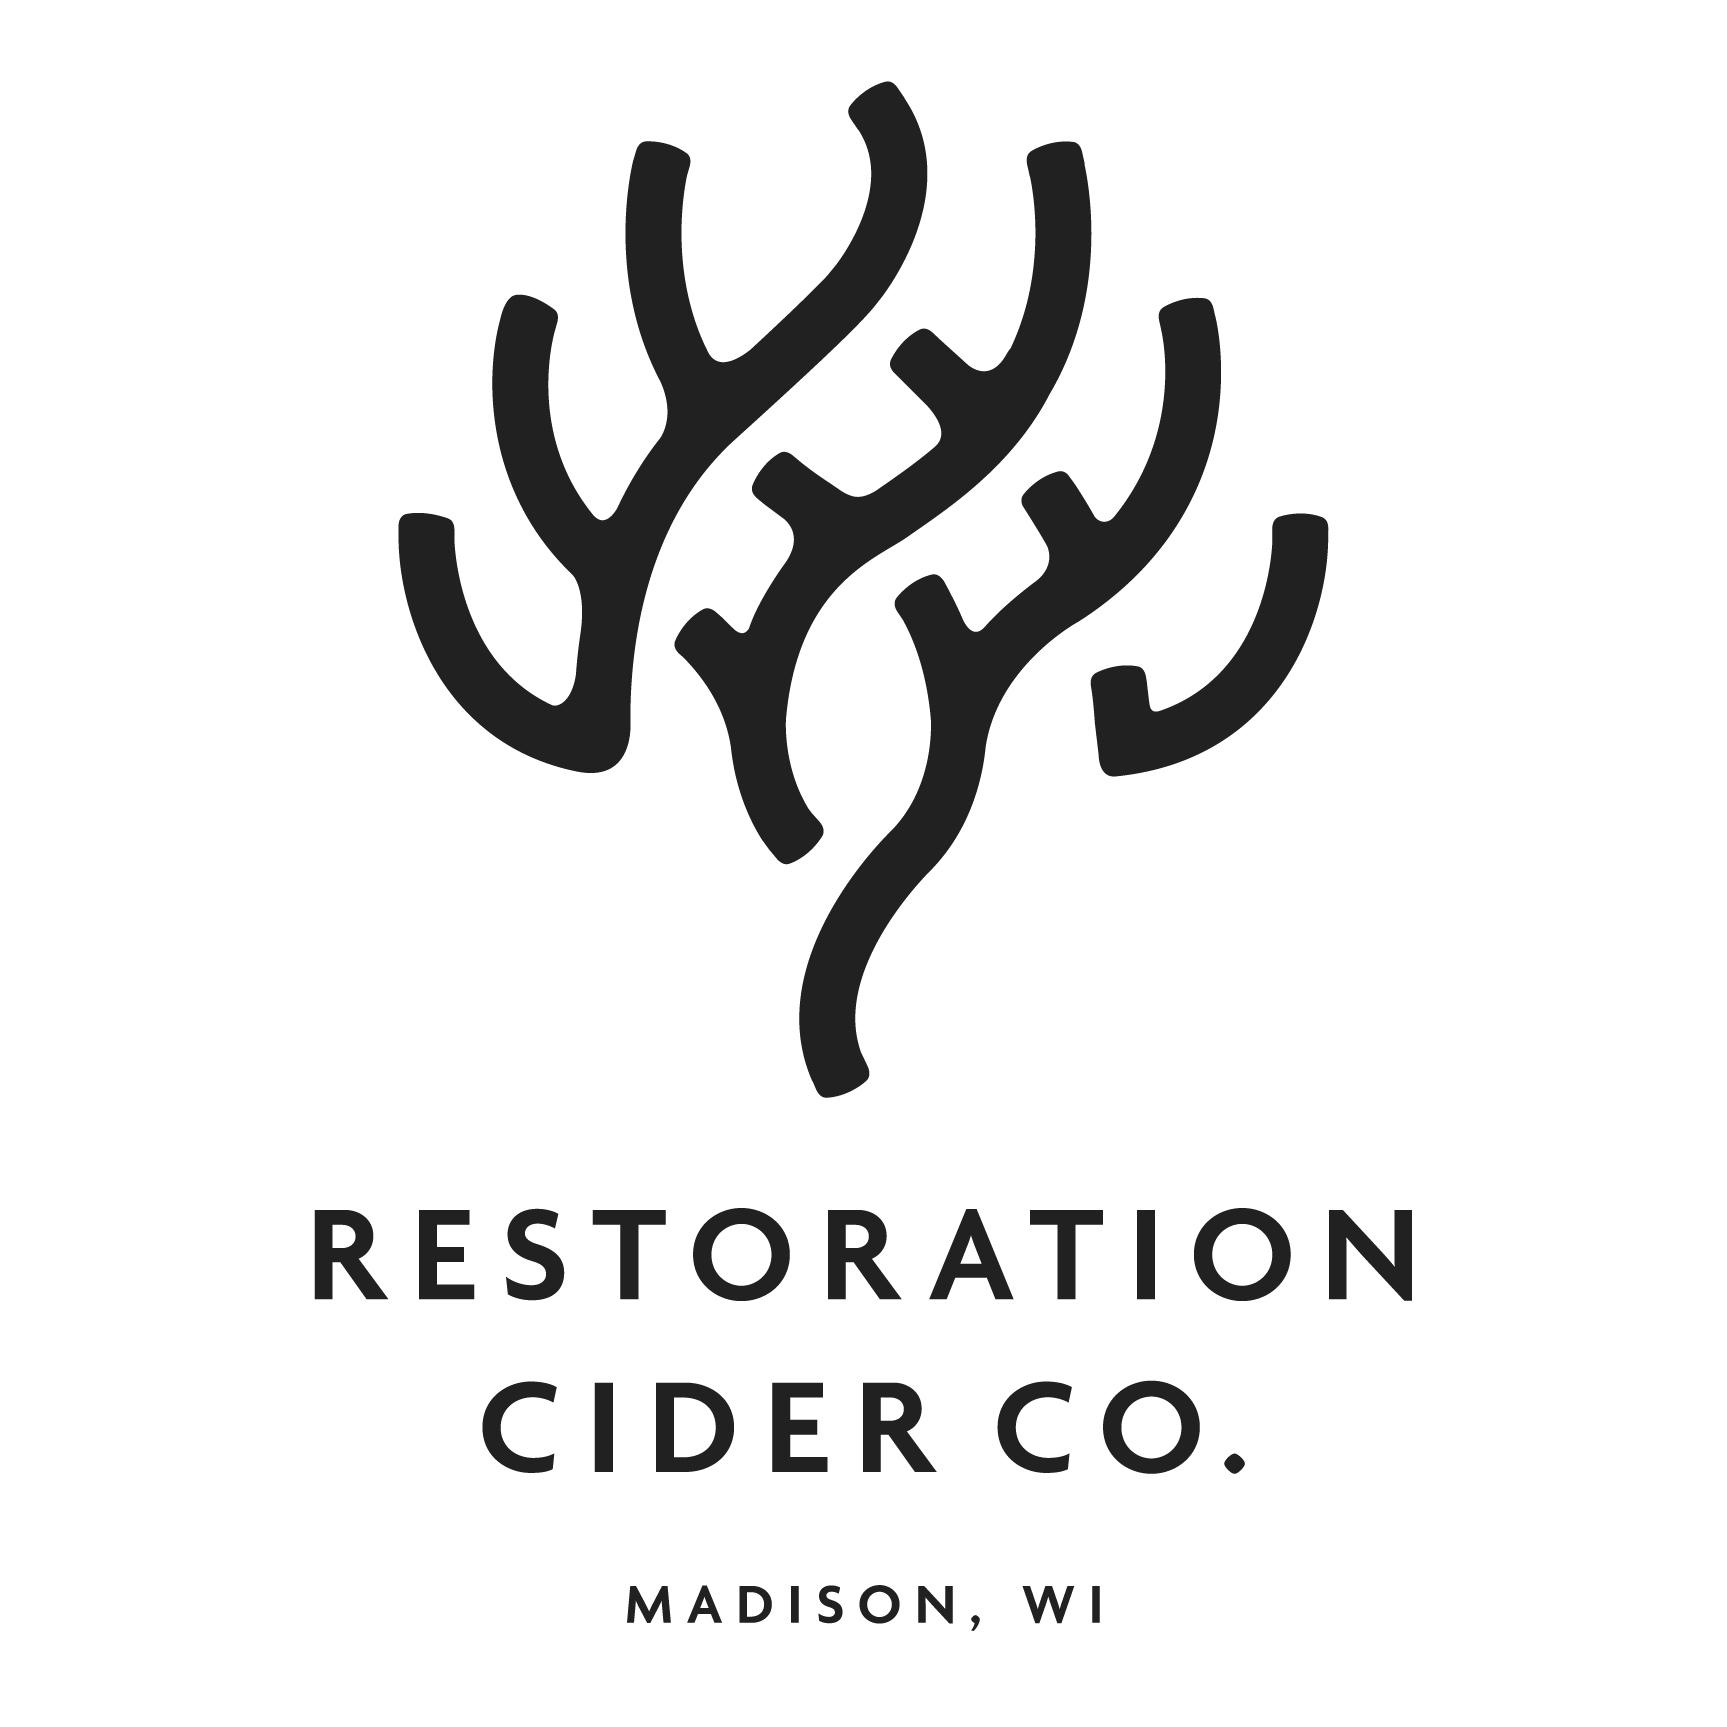 restoration_logomark_type.jpg